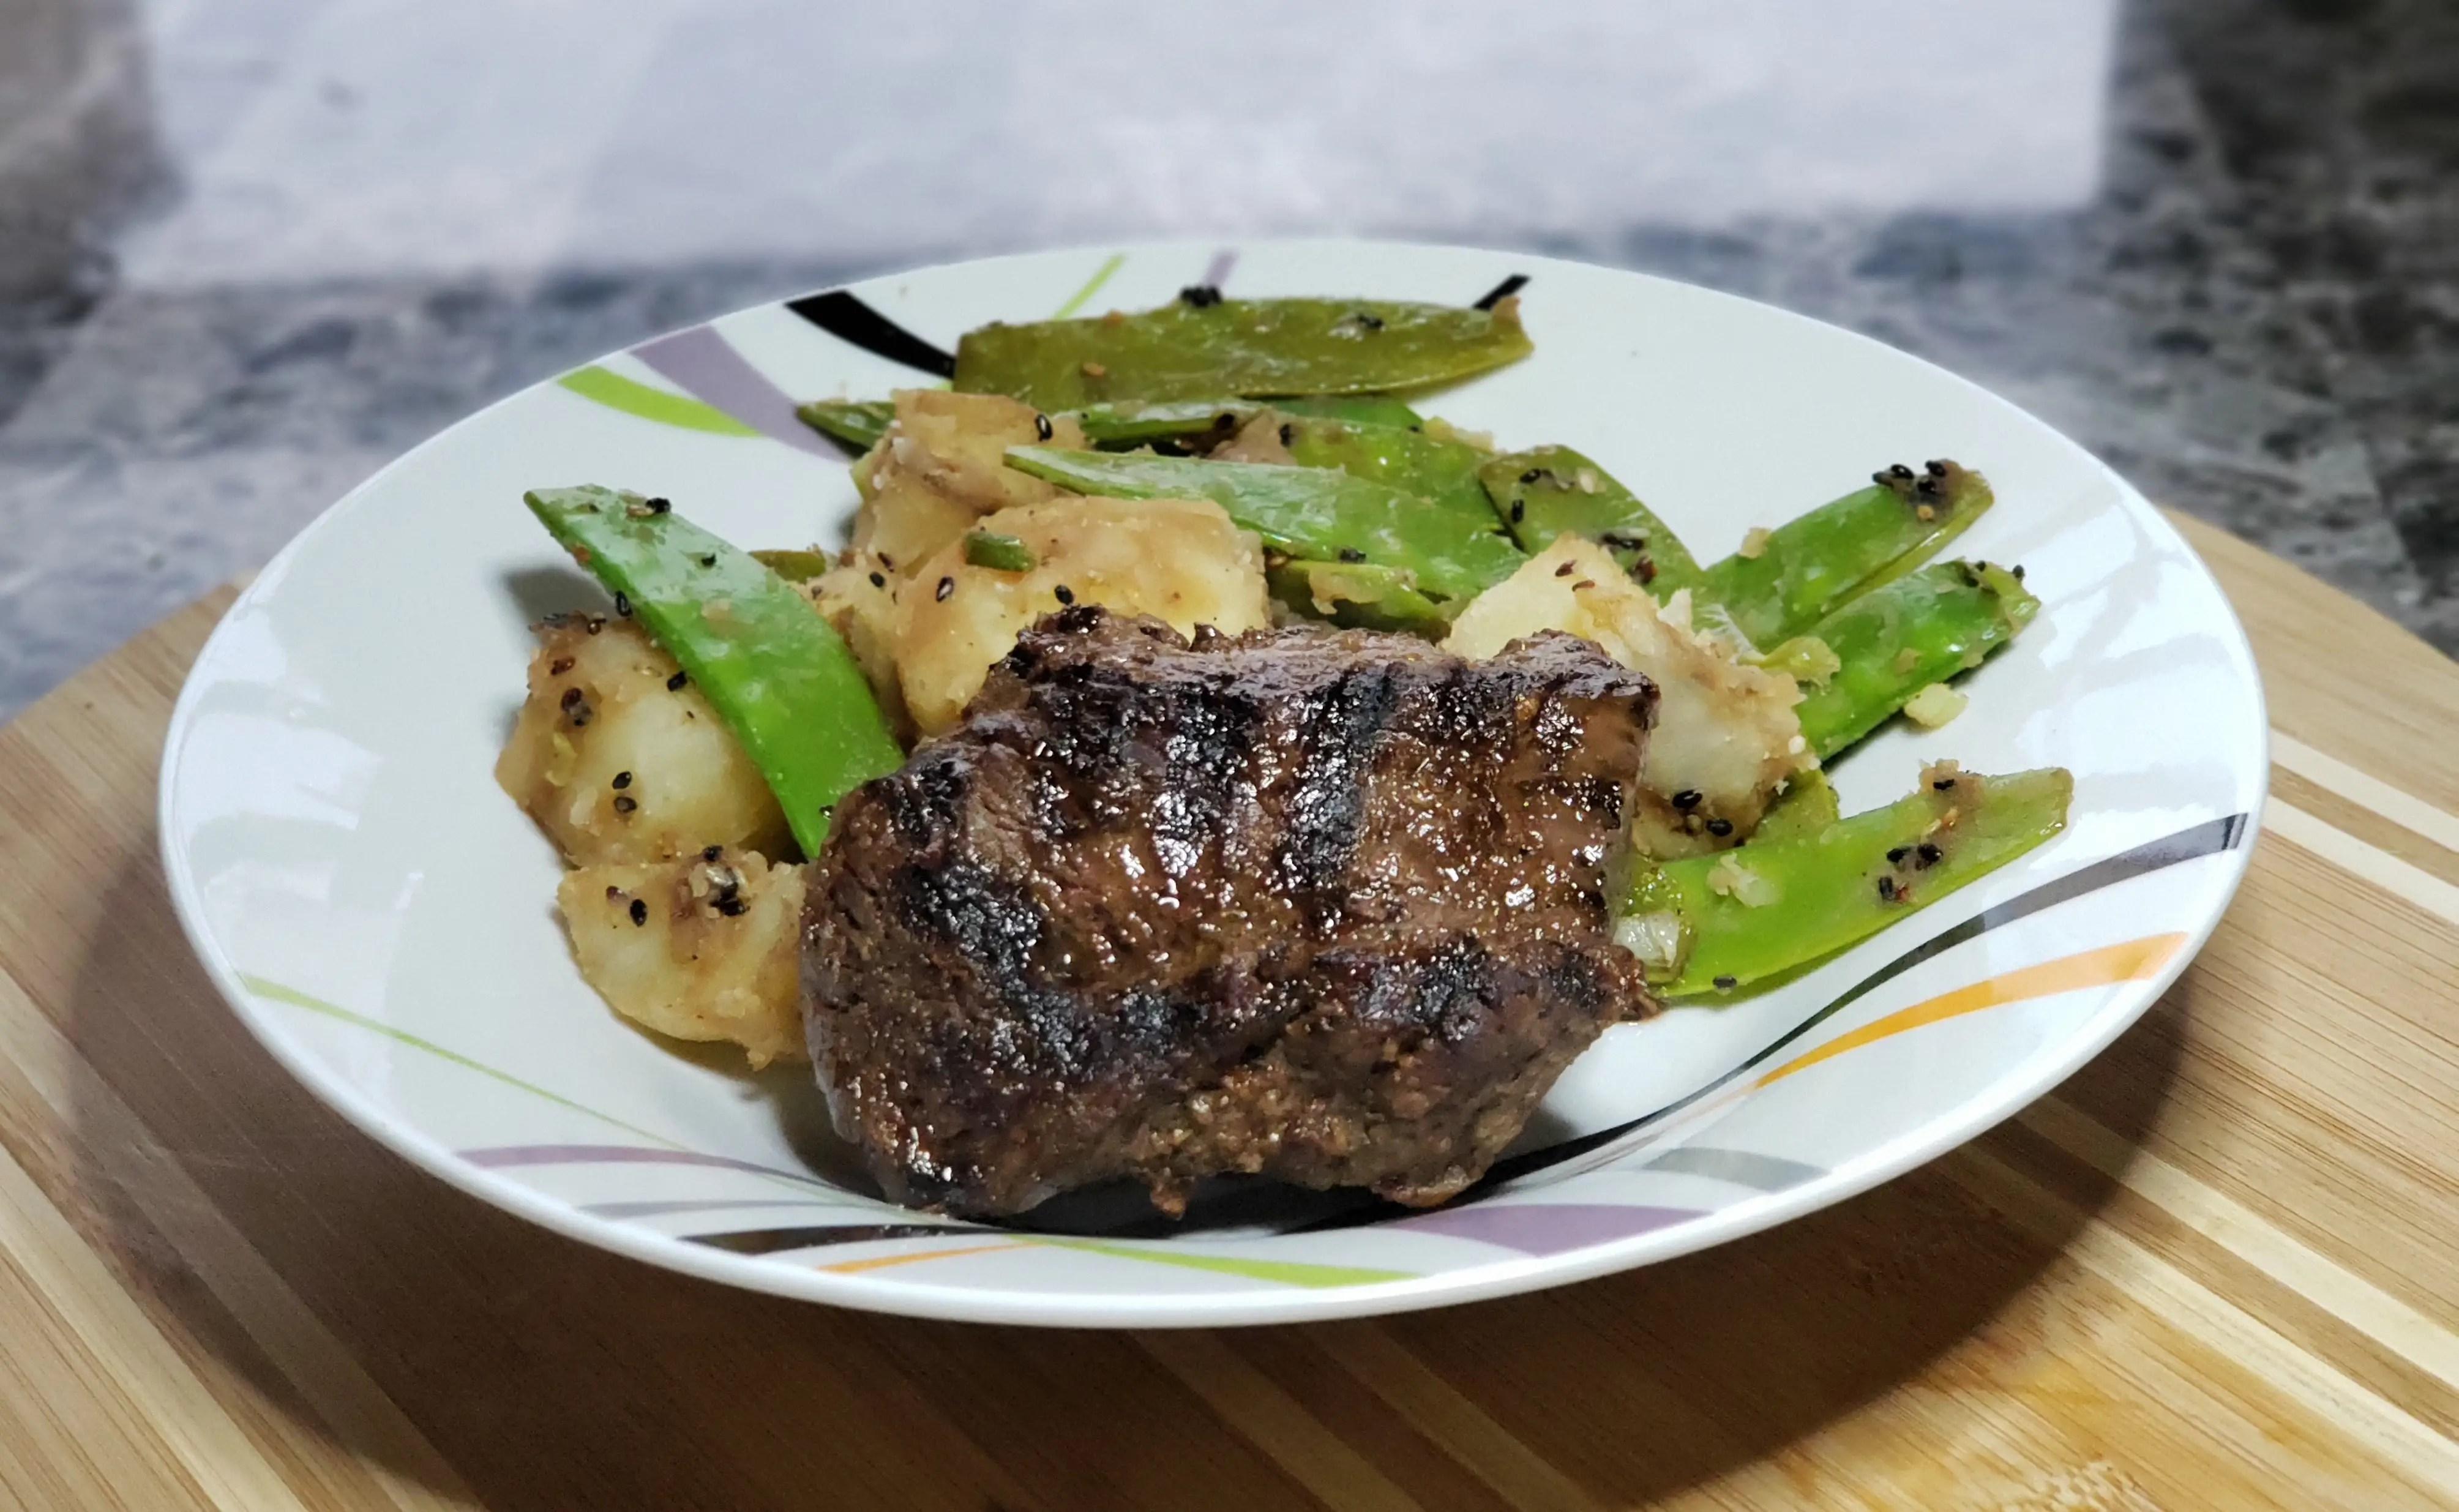 Tamari Grilled Steak with Snow Peas